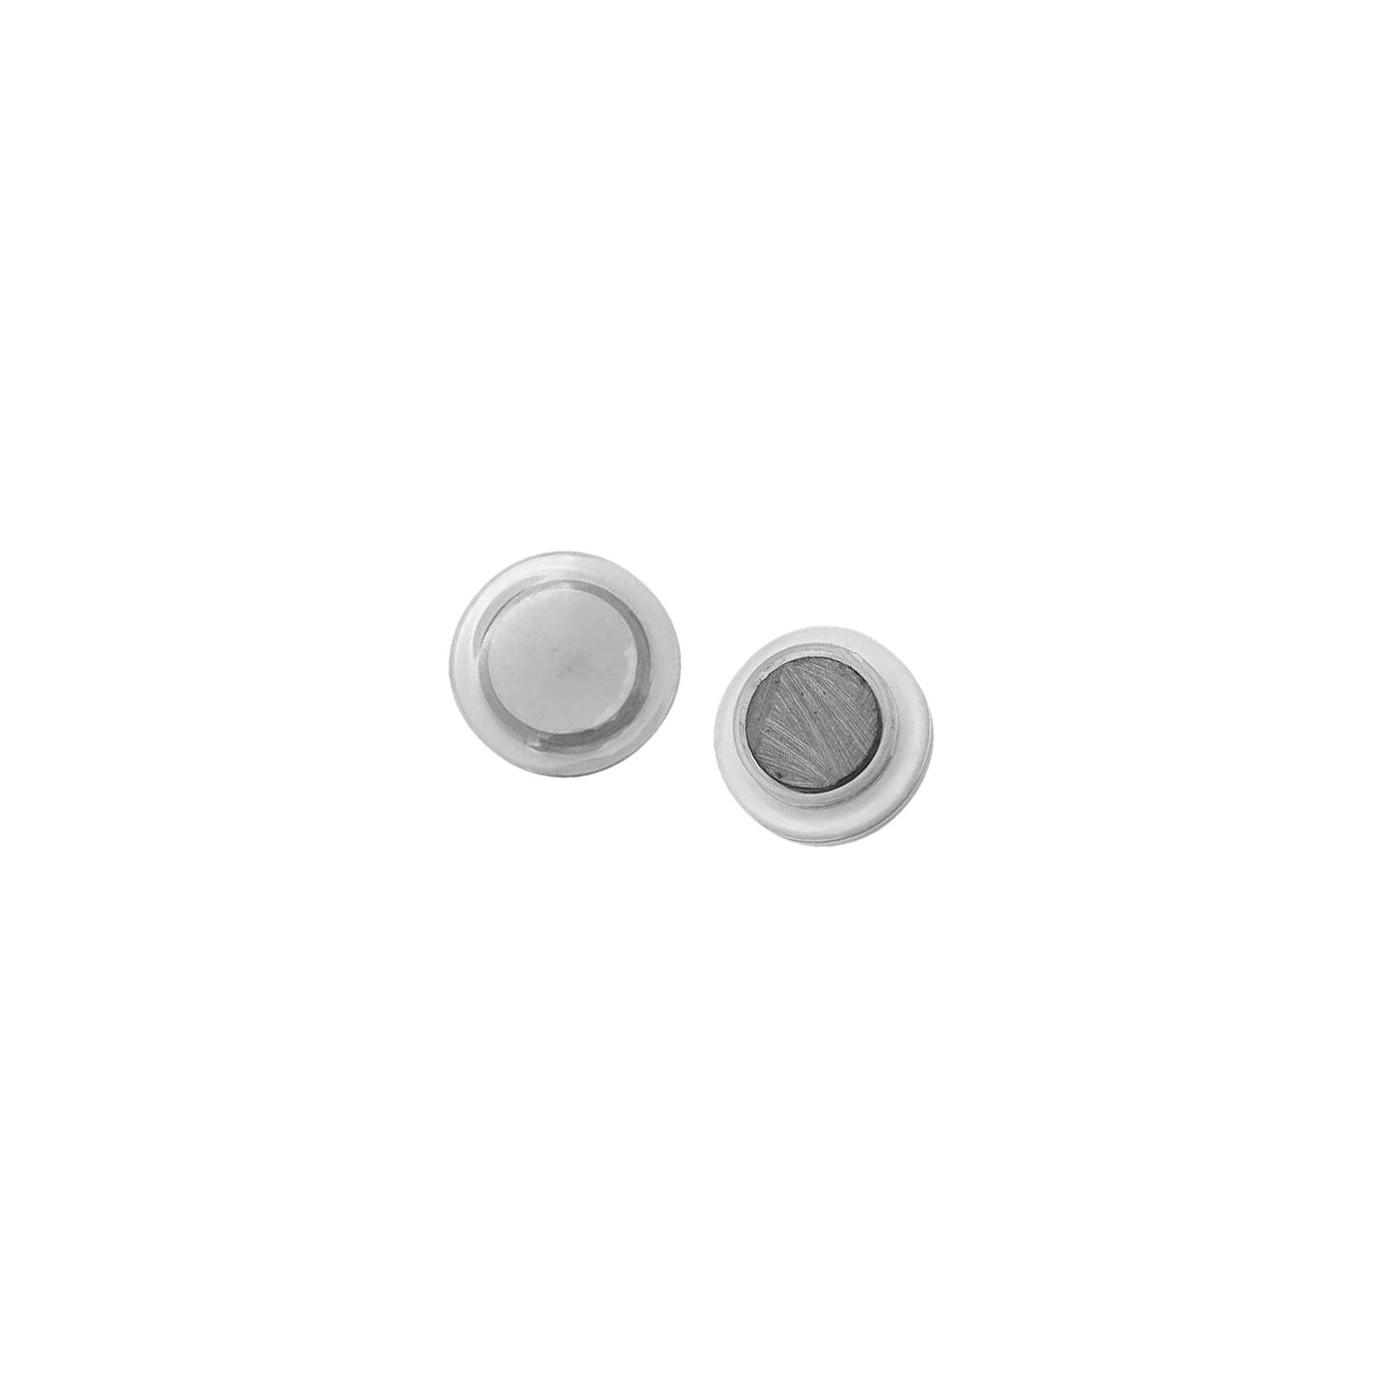 Set van 32 whiteboard magneten (3 cm, transparant)  - 1